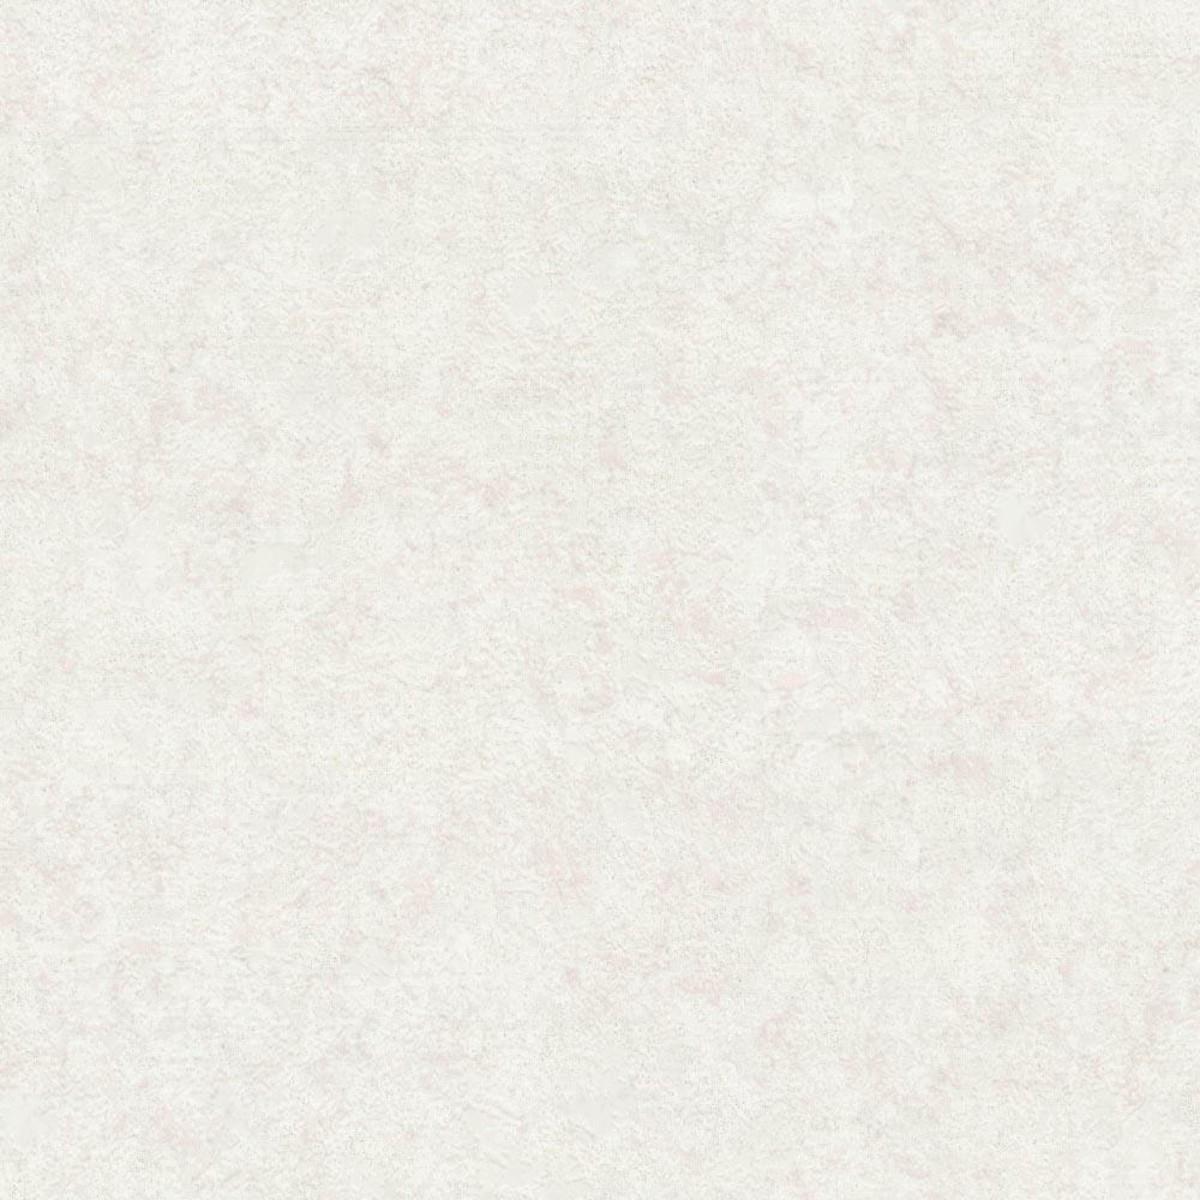 Обои виниловые Палитра Verona PL71609-21 1.06 м